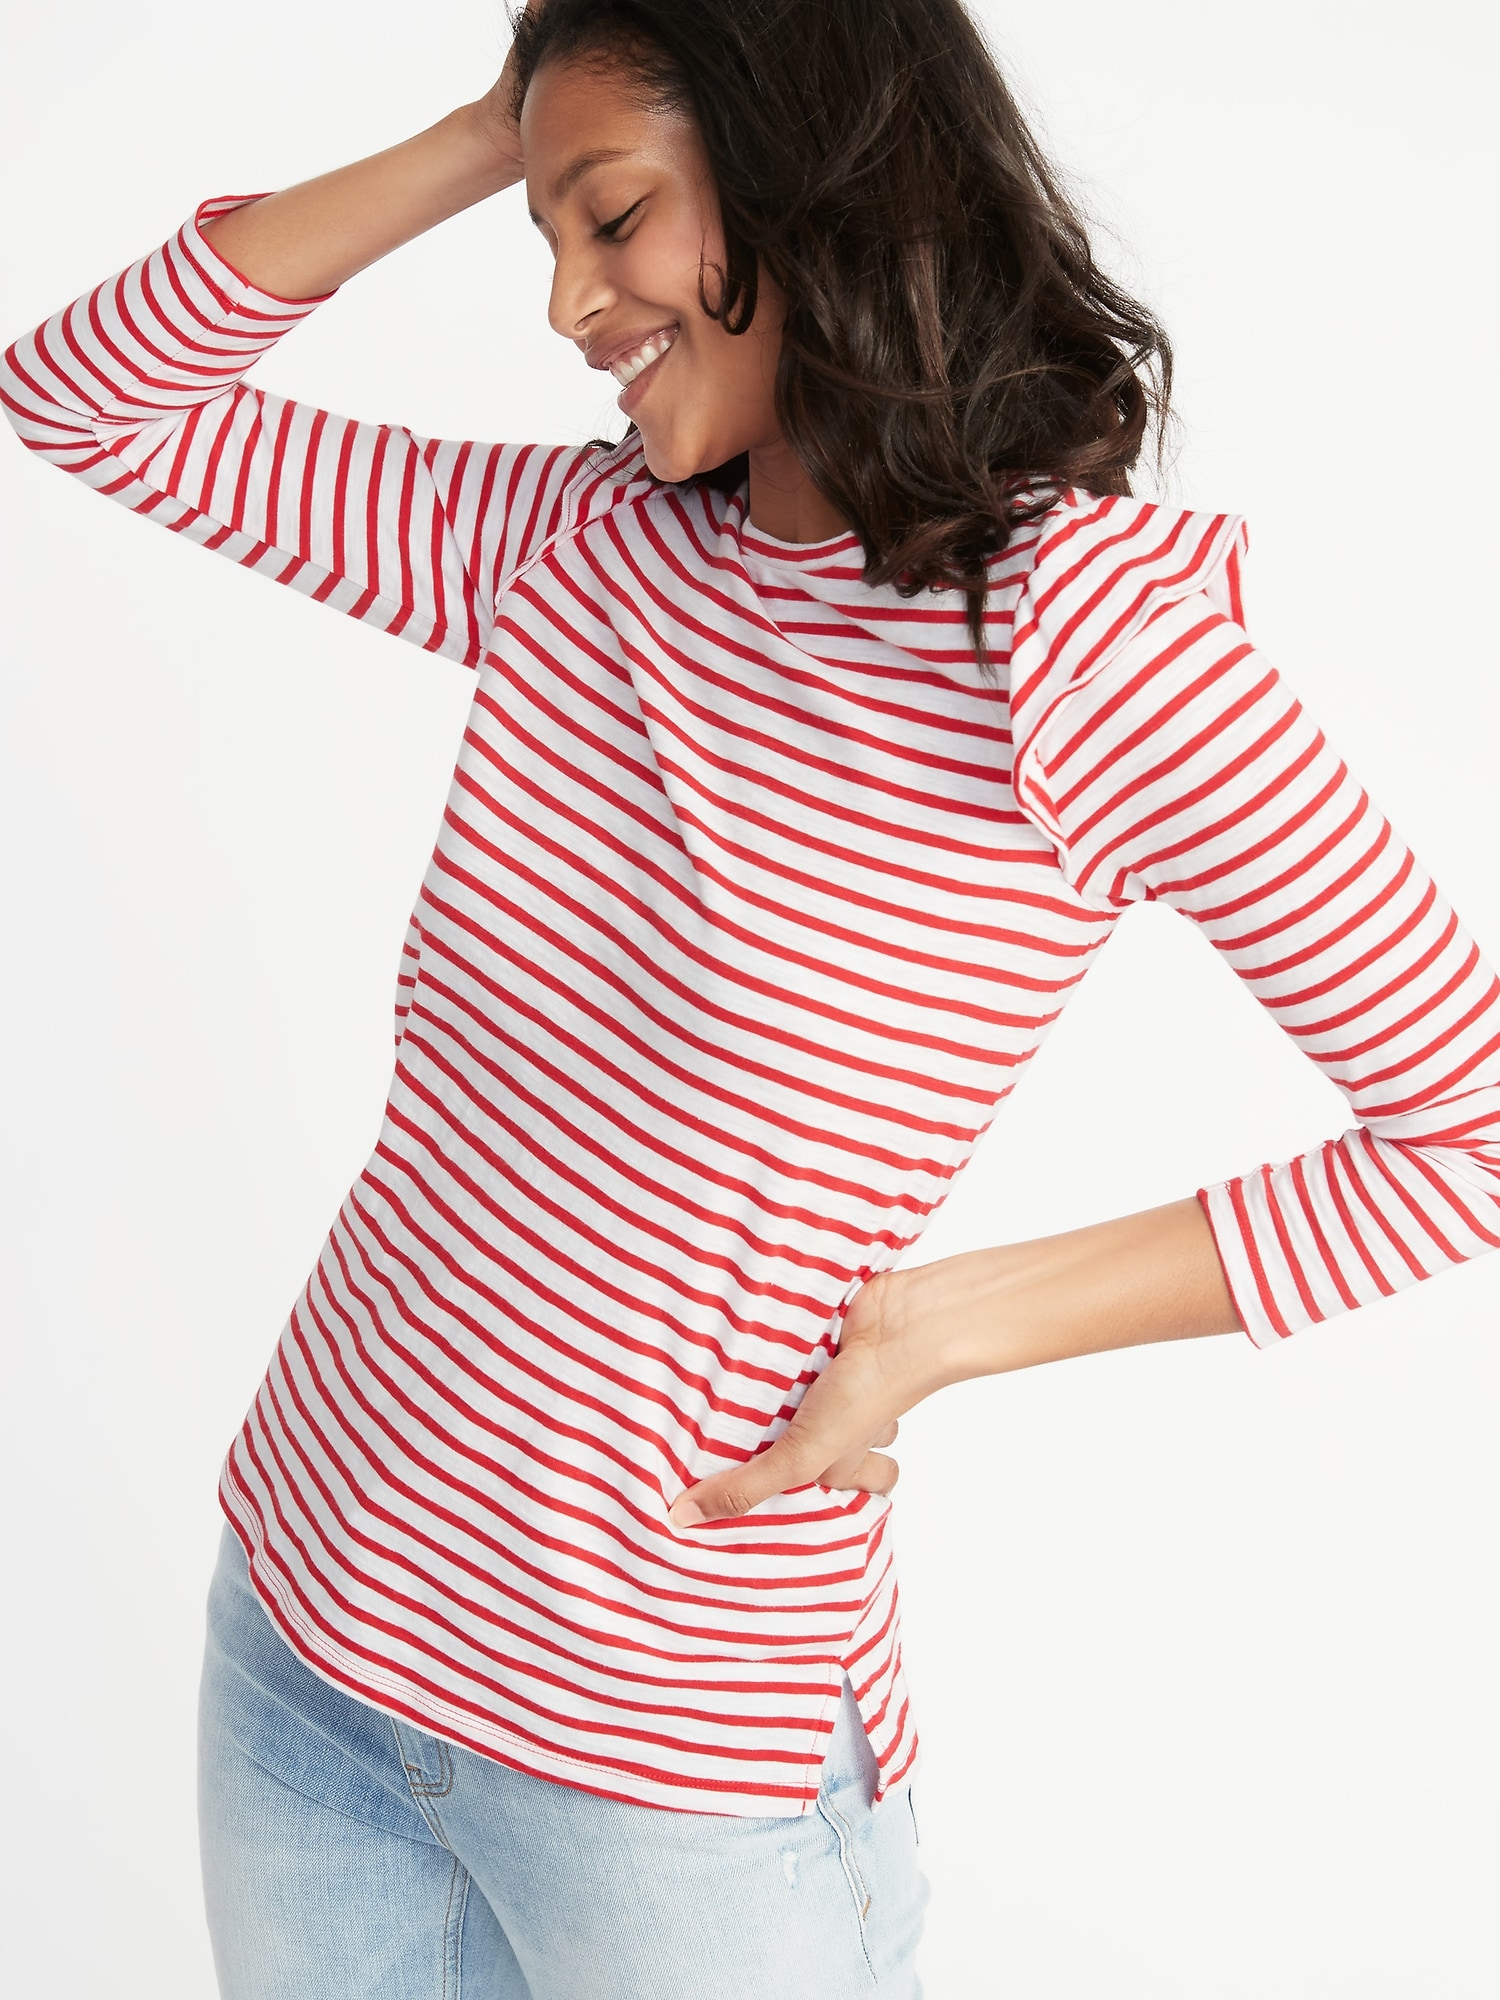 0535960daae082 Relaxed Ruffle-Trim Slub-Knit Top for Women